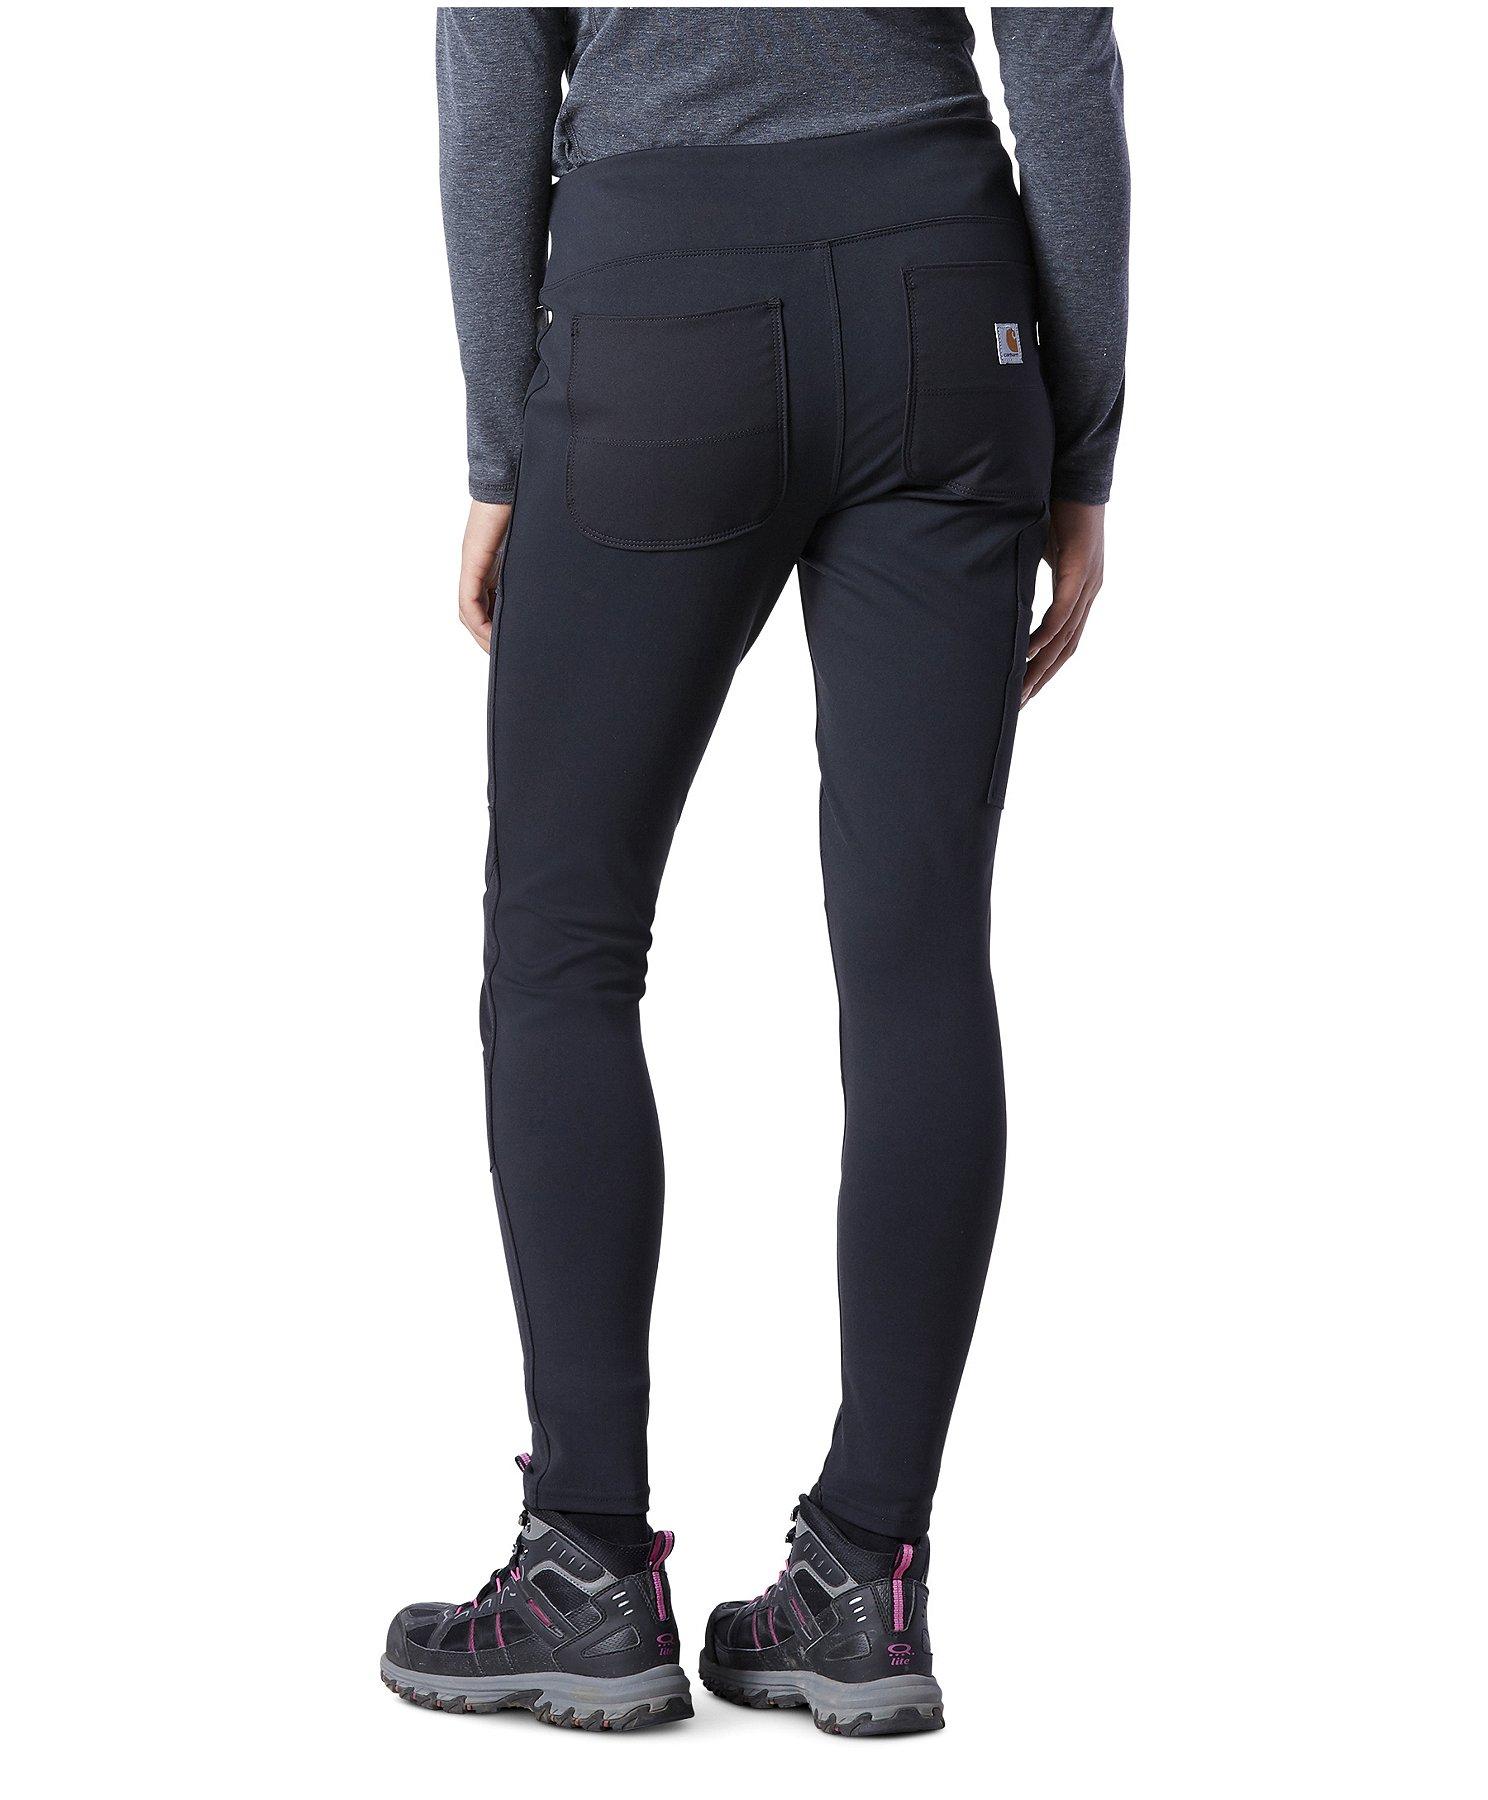 Carhartt Womens Force Utility Legging